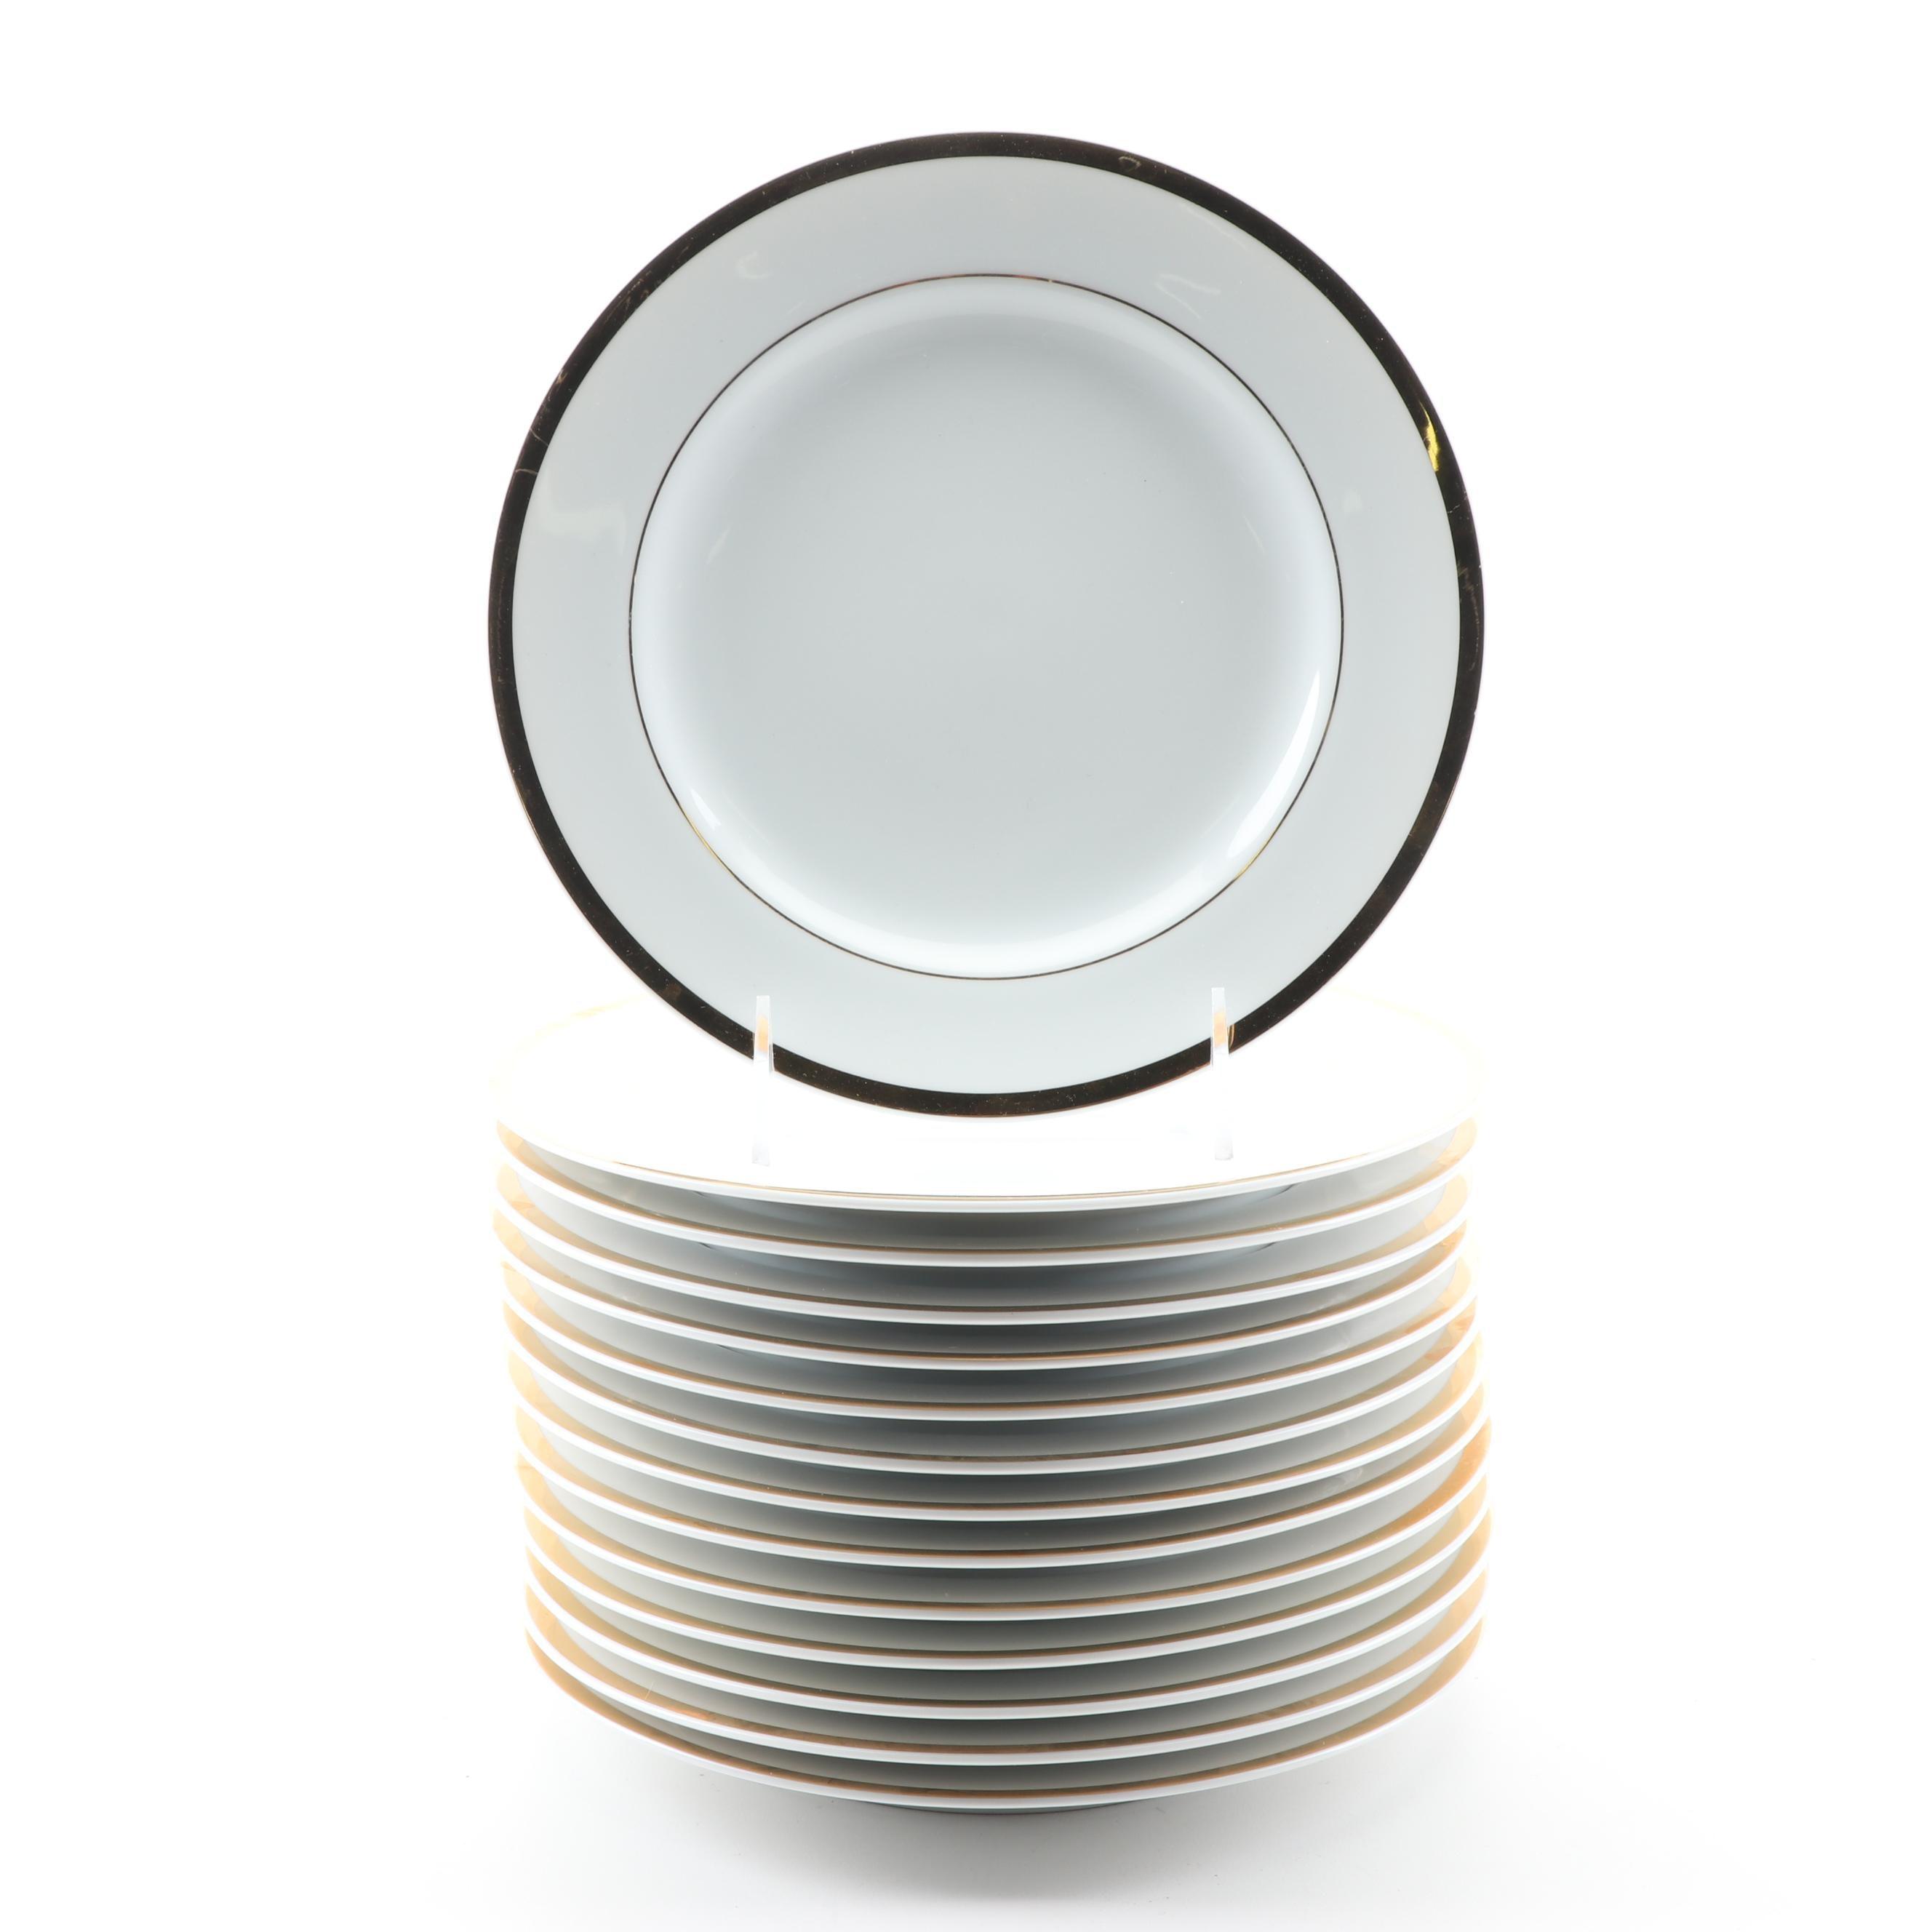 Linens 'n Things Porcelain Salad Plates